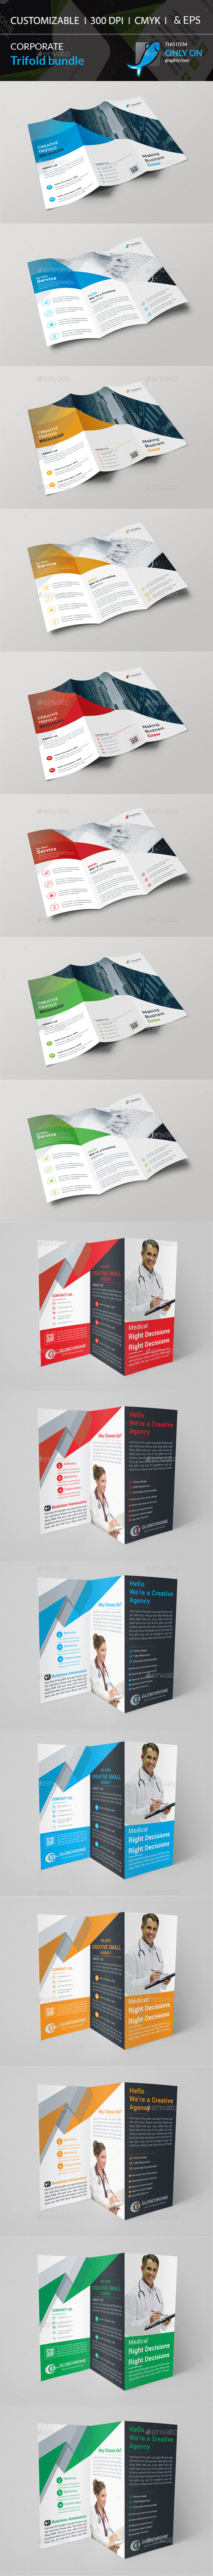 GraphicRiver Trifold Brochure Bundle 20564627